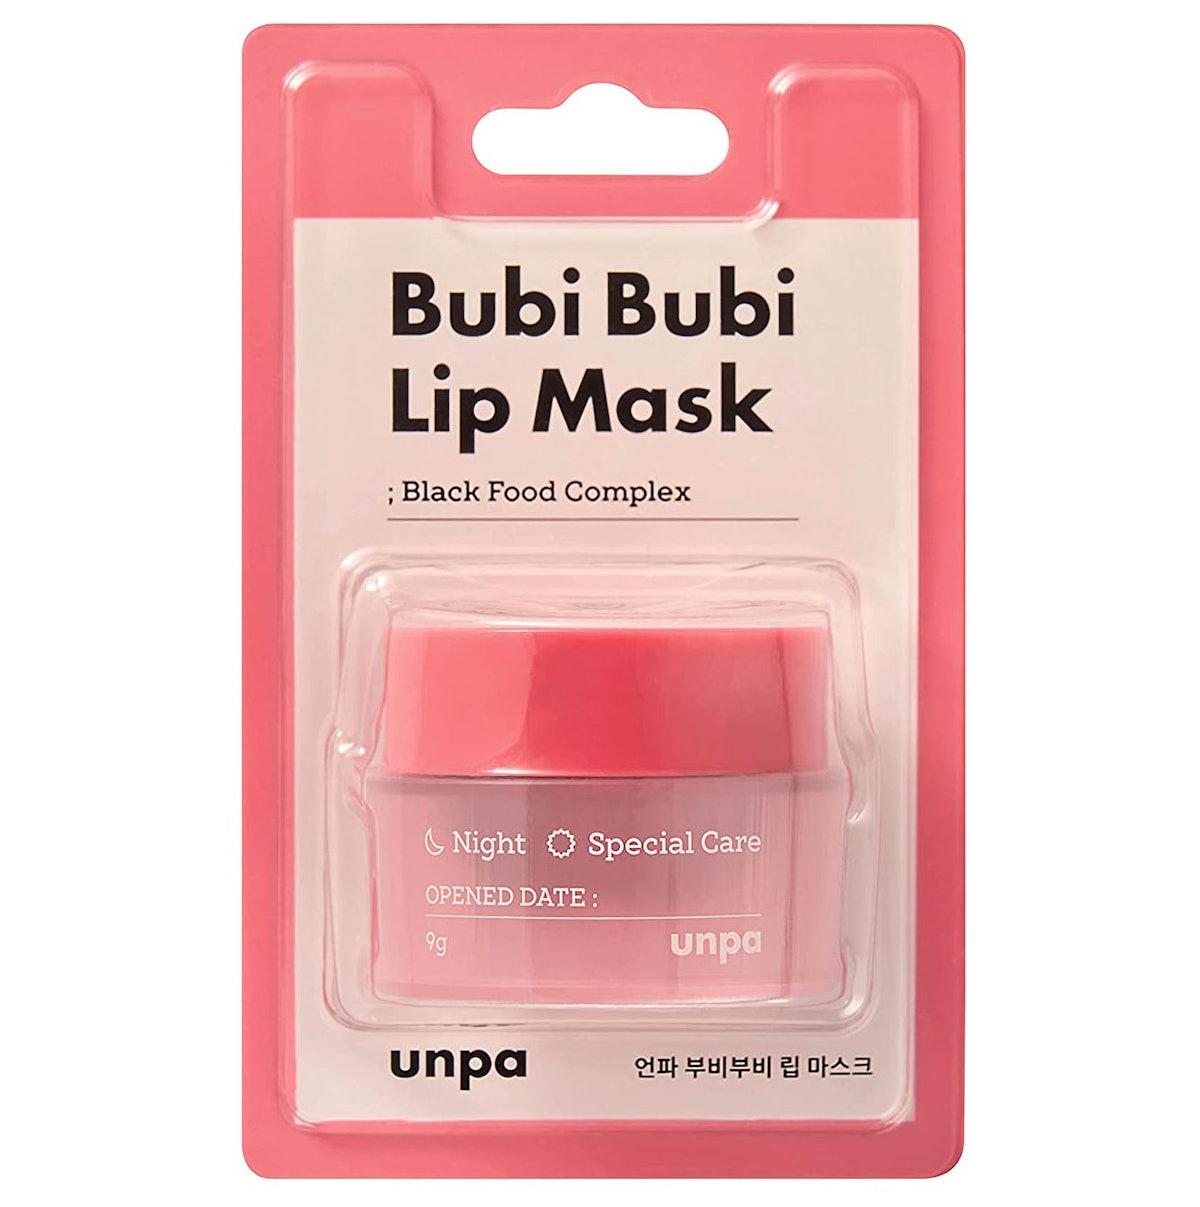 UNPA Bubi Bubi Lip Mask